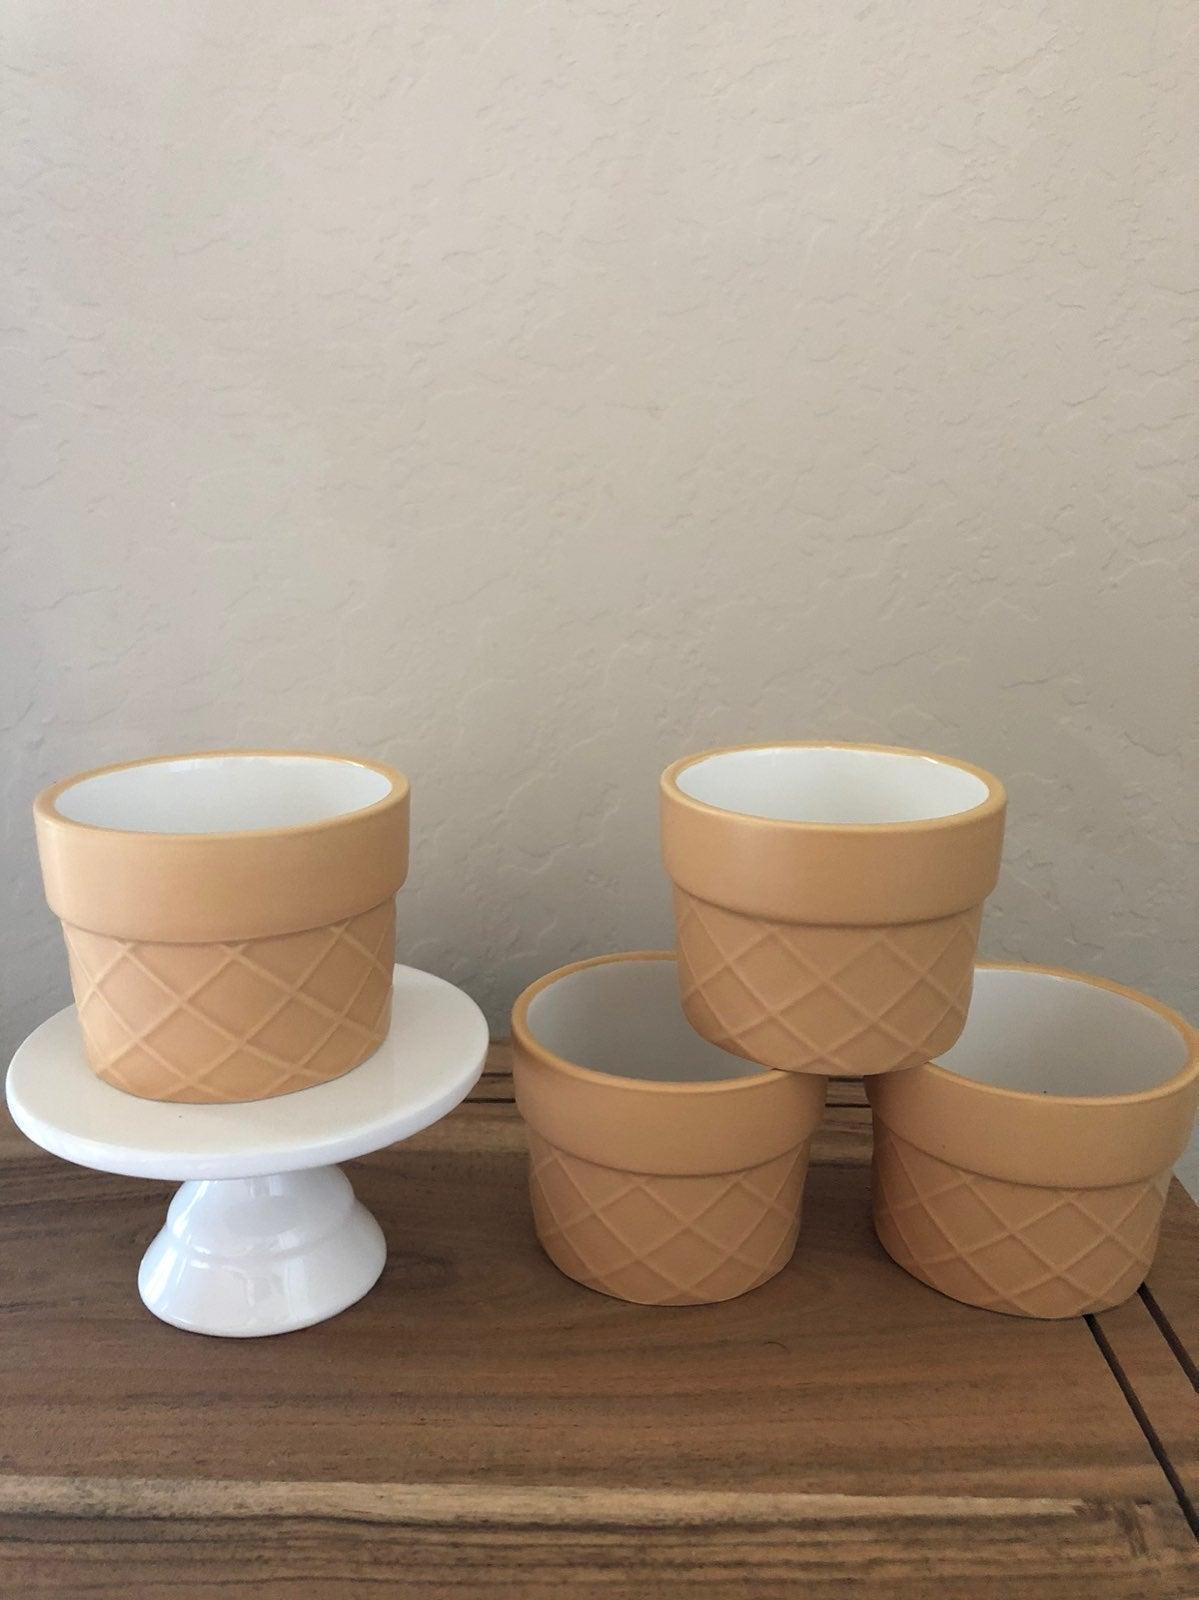 ceramic ice cream bowls with cupcake sta